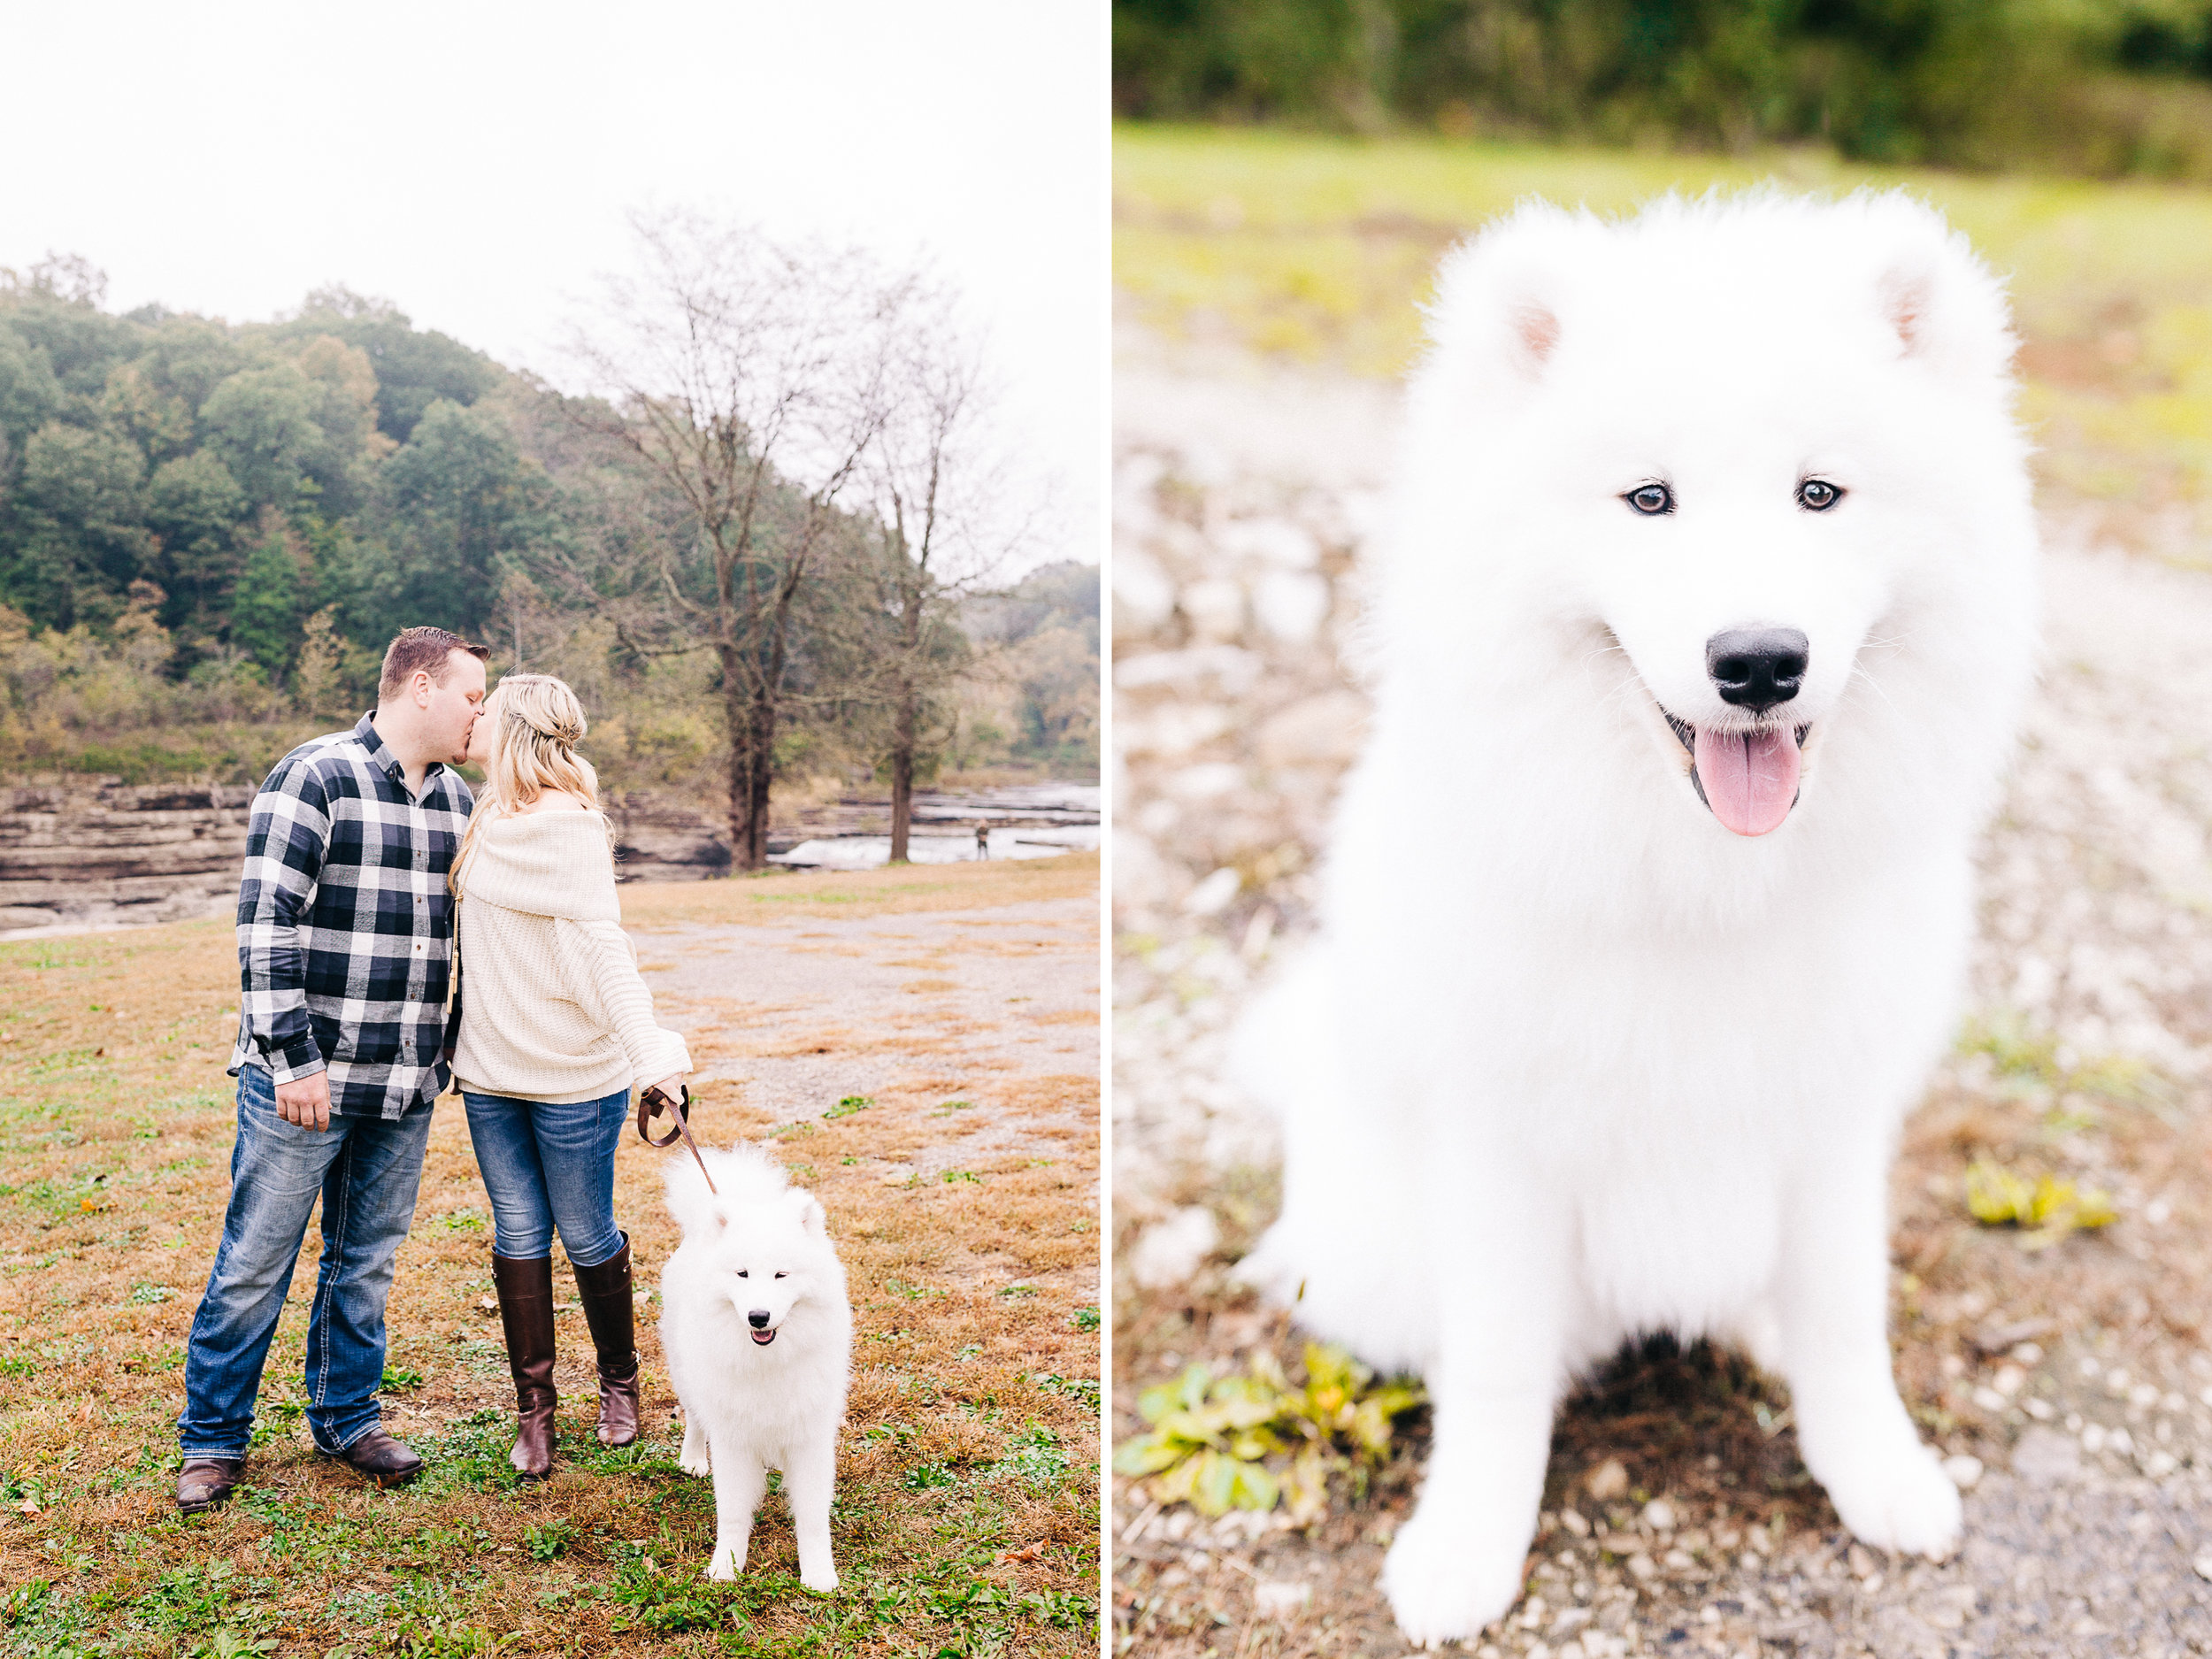 Dorothy_Louise_Photography_Alyssa_Drew_Engagement3.jpg